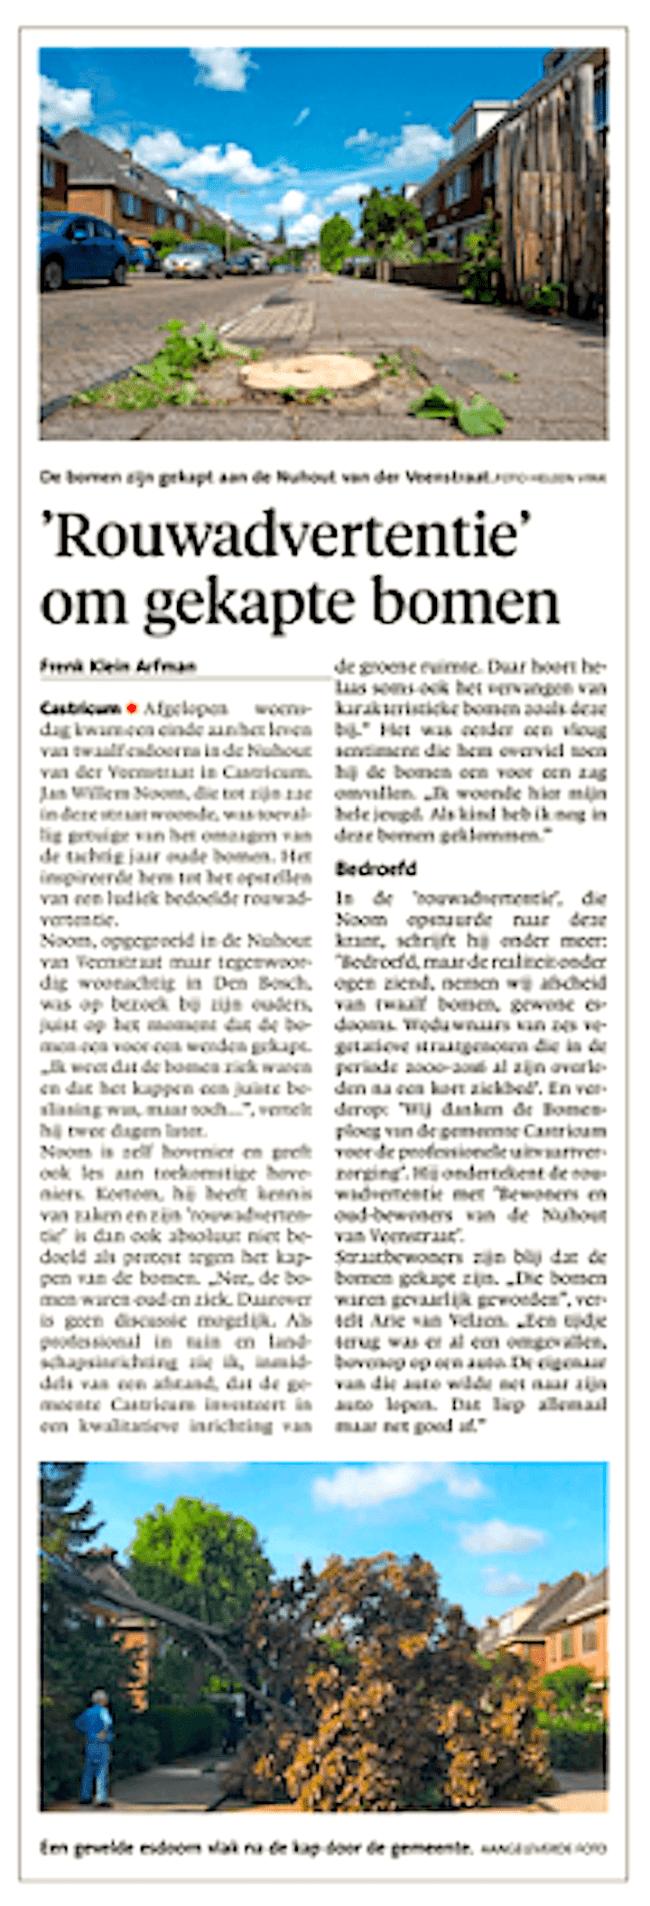 Alkmaarse Courant, 18 augustus 2018